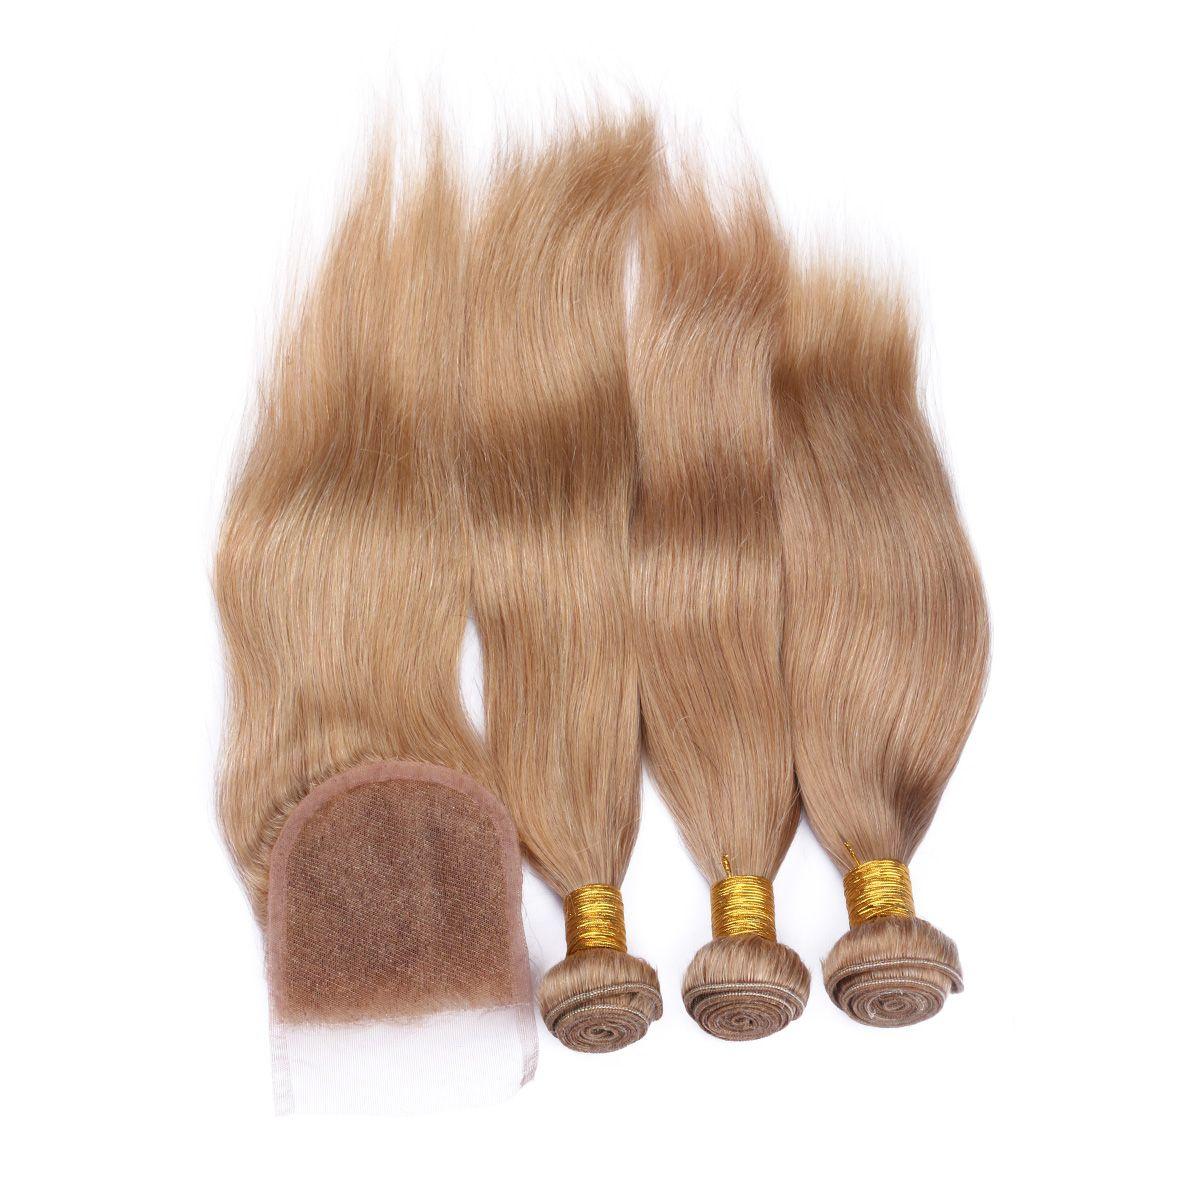 8A Brazilian #27 Honey Blonde Straight Human Hair With 4*4 Lace Closure Brazilian Blonde Top Closure With Hair Bundles